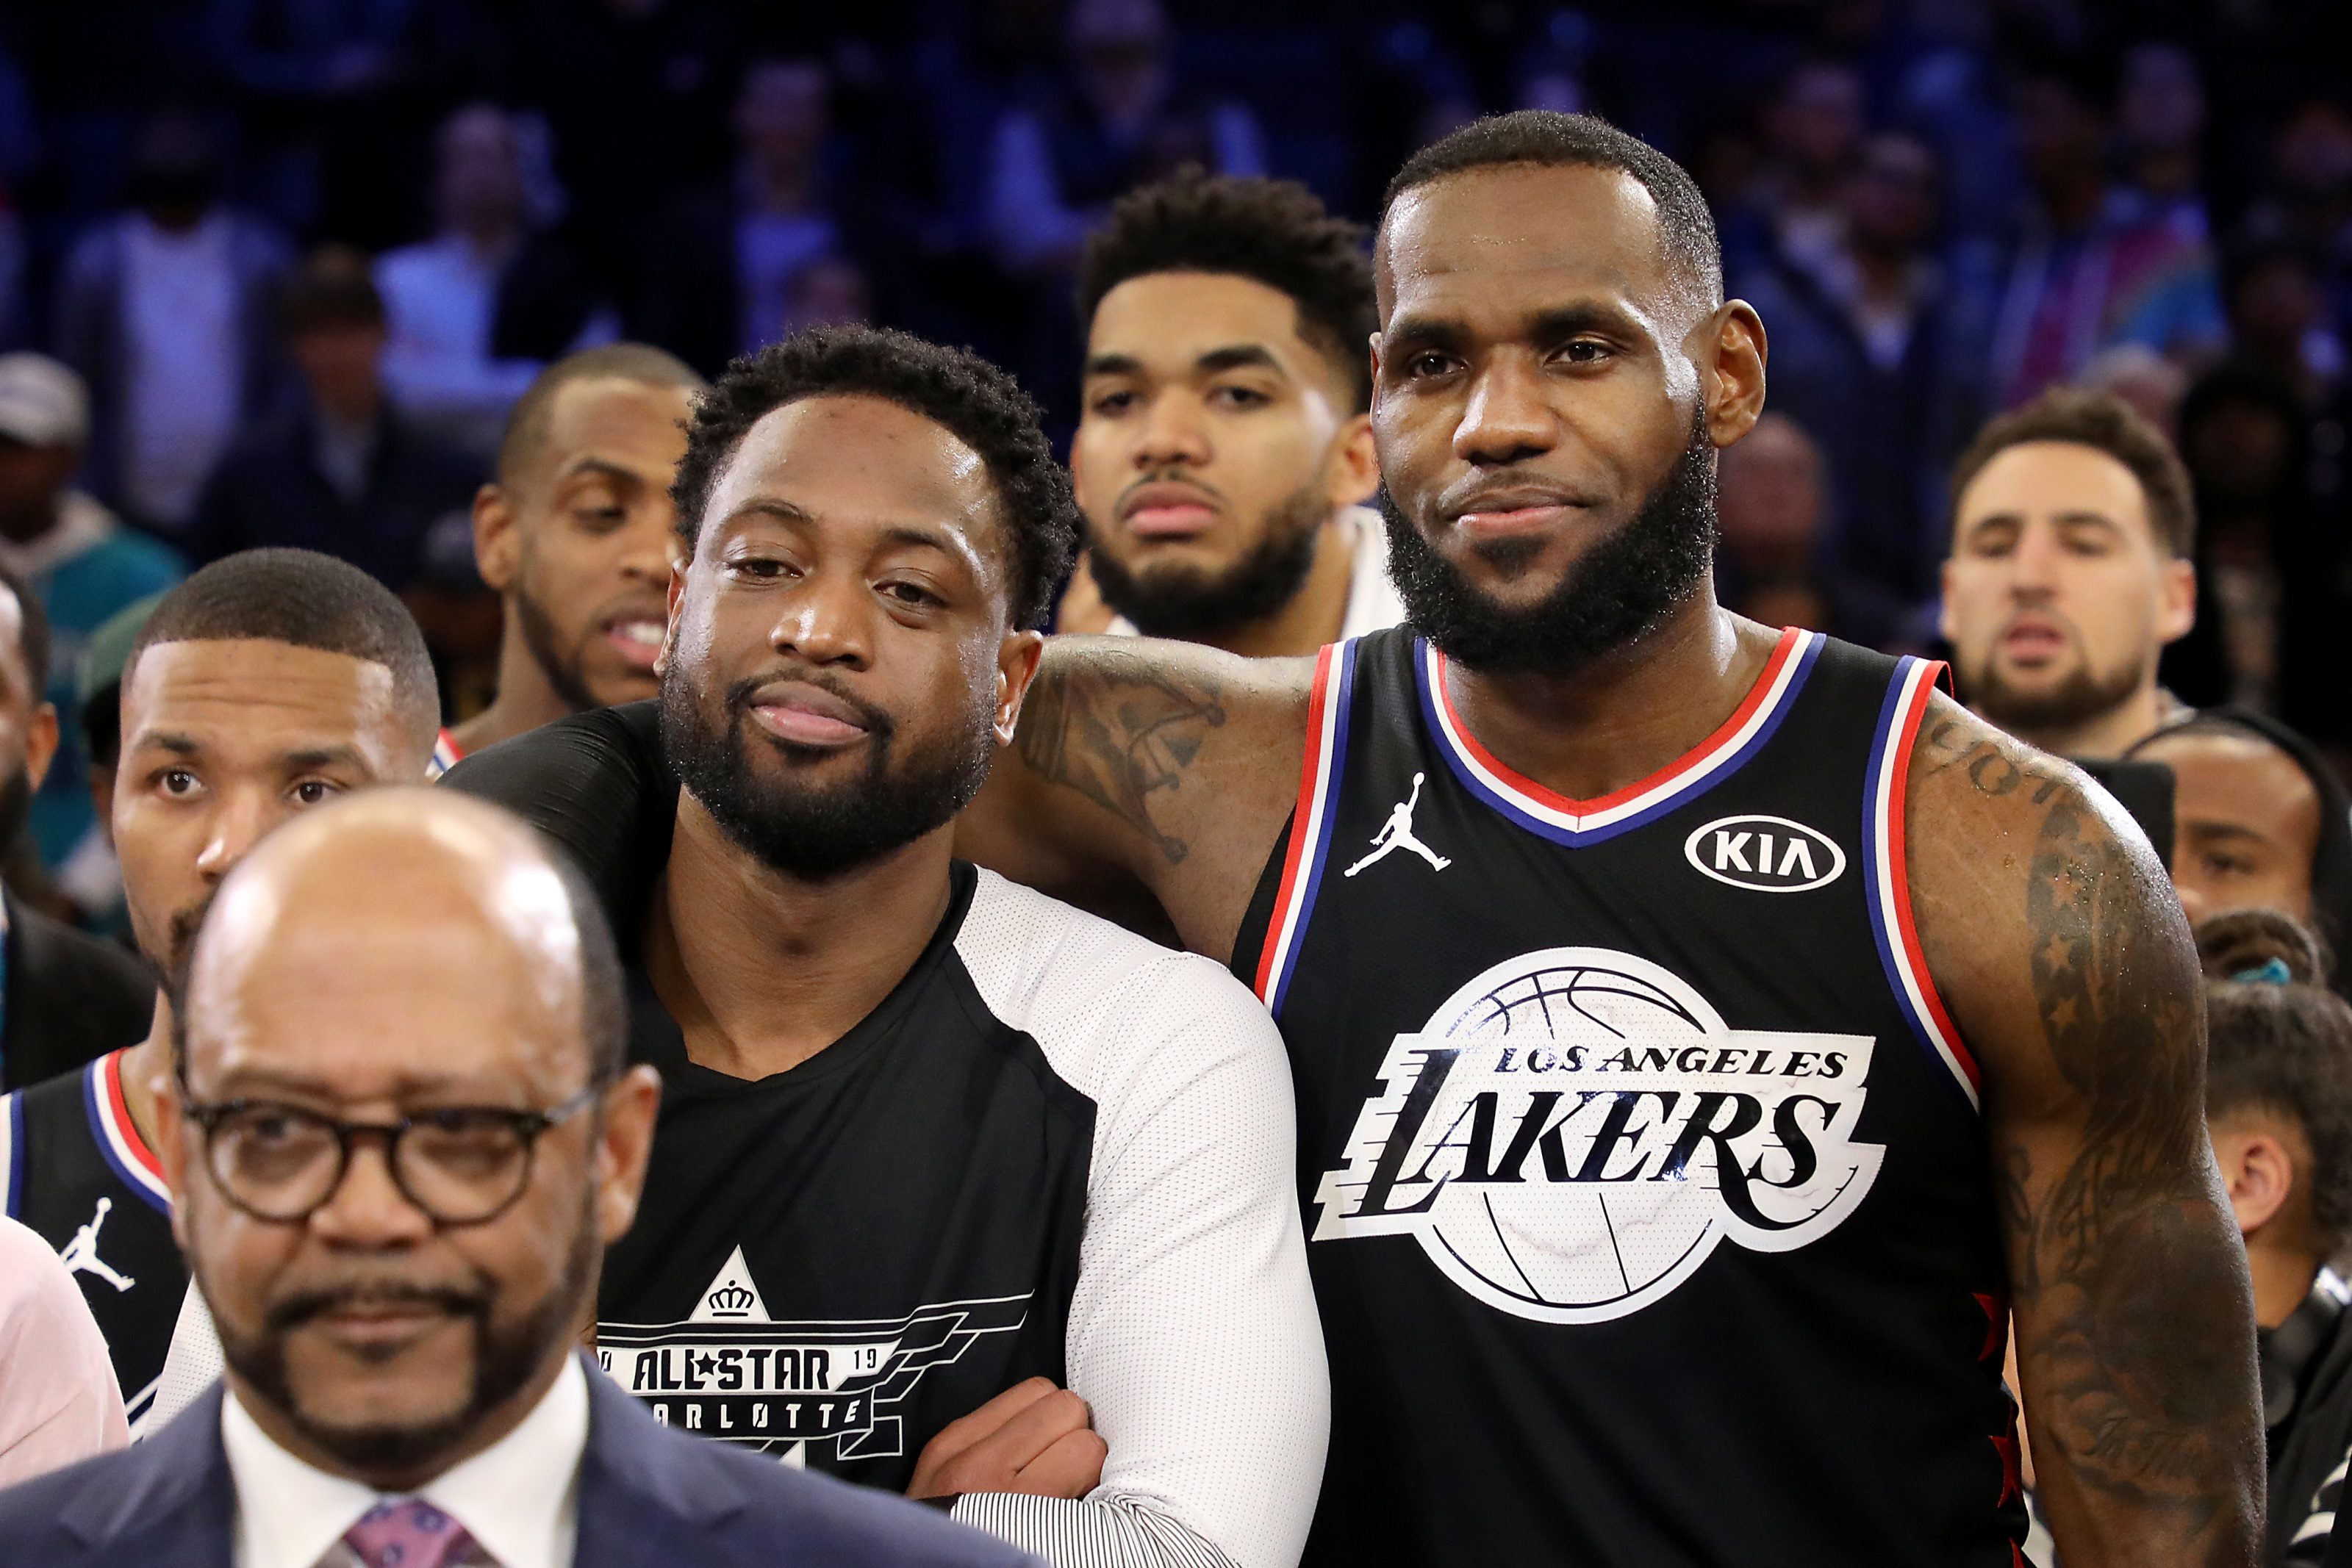 Miami Heat among betting favorites to